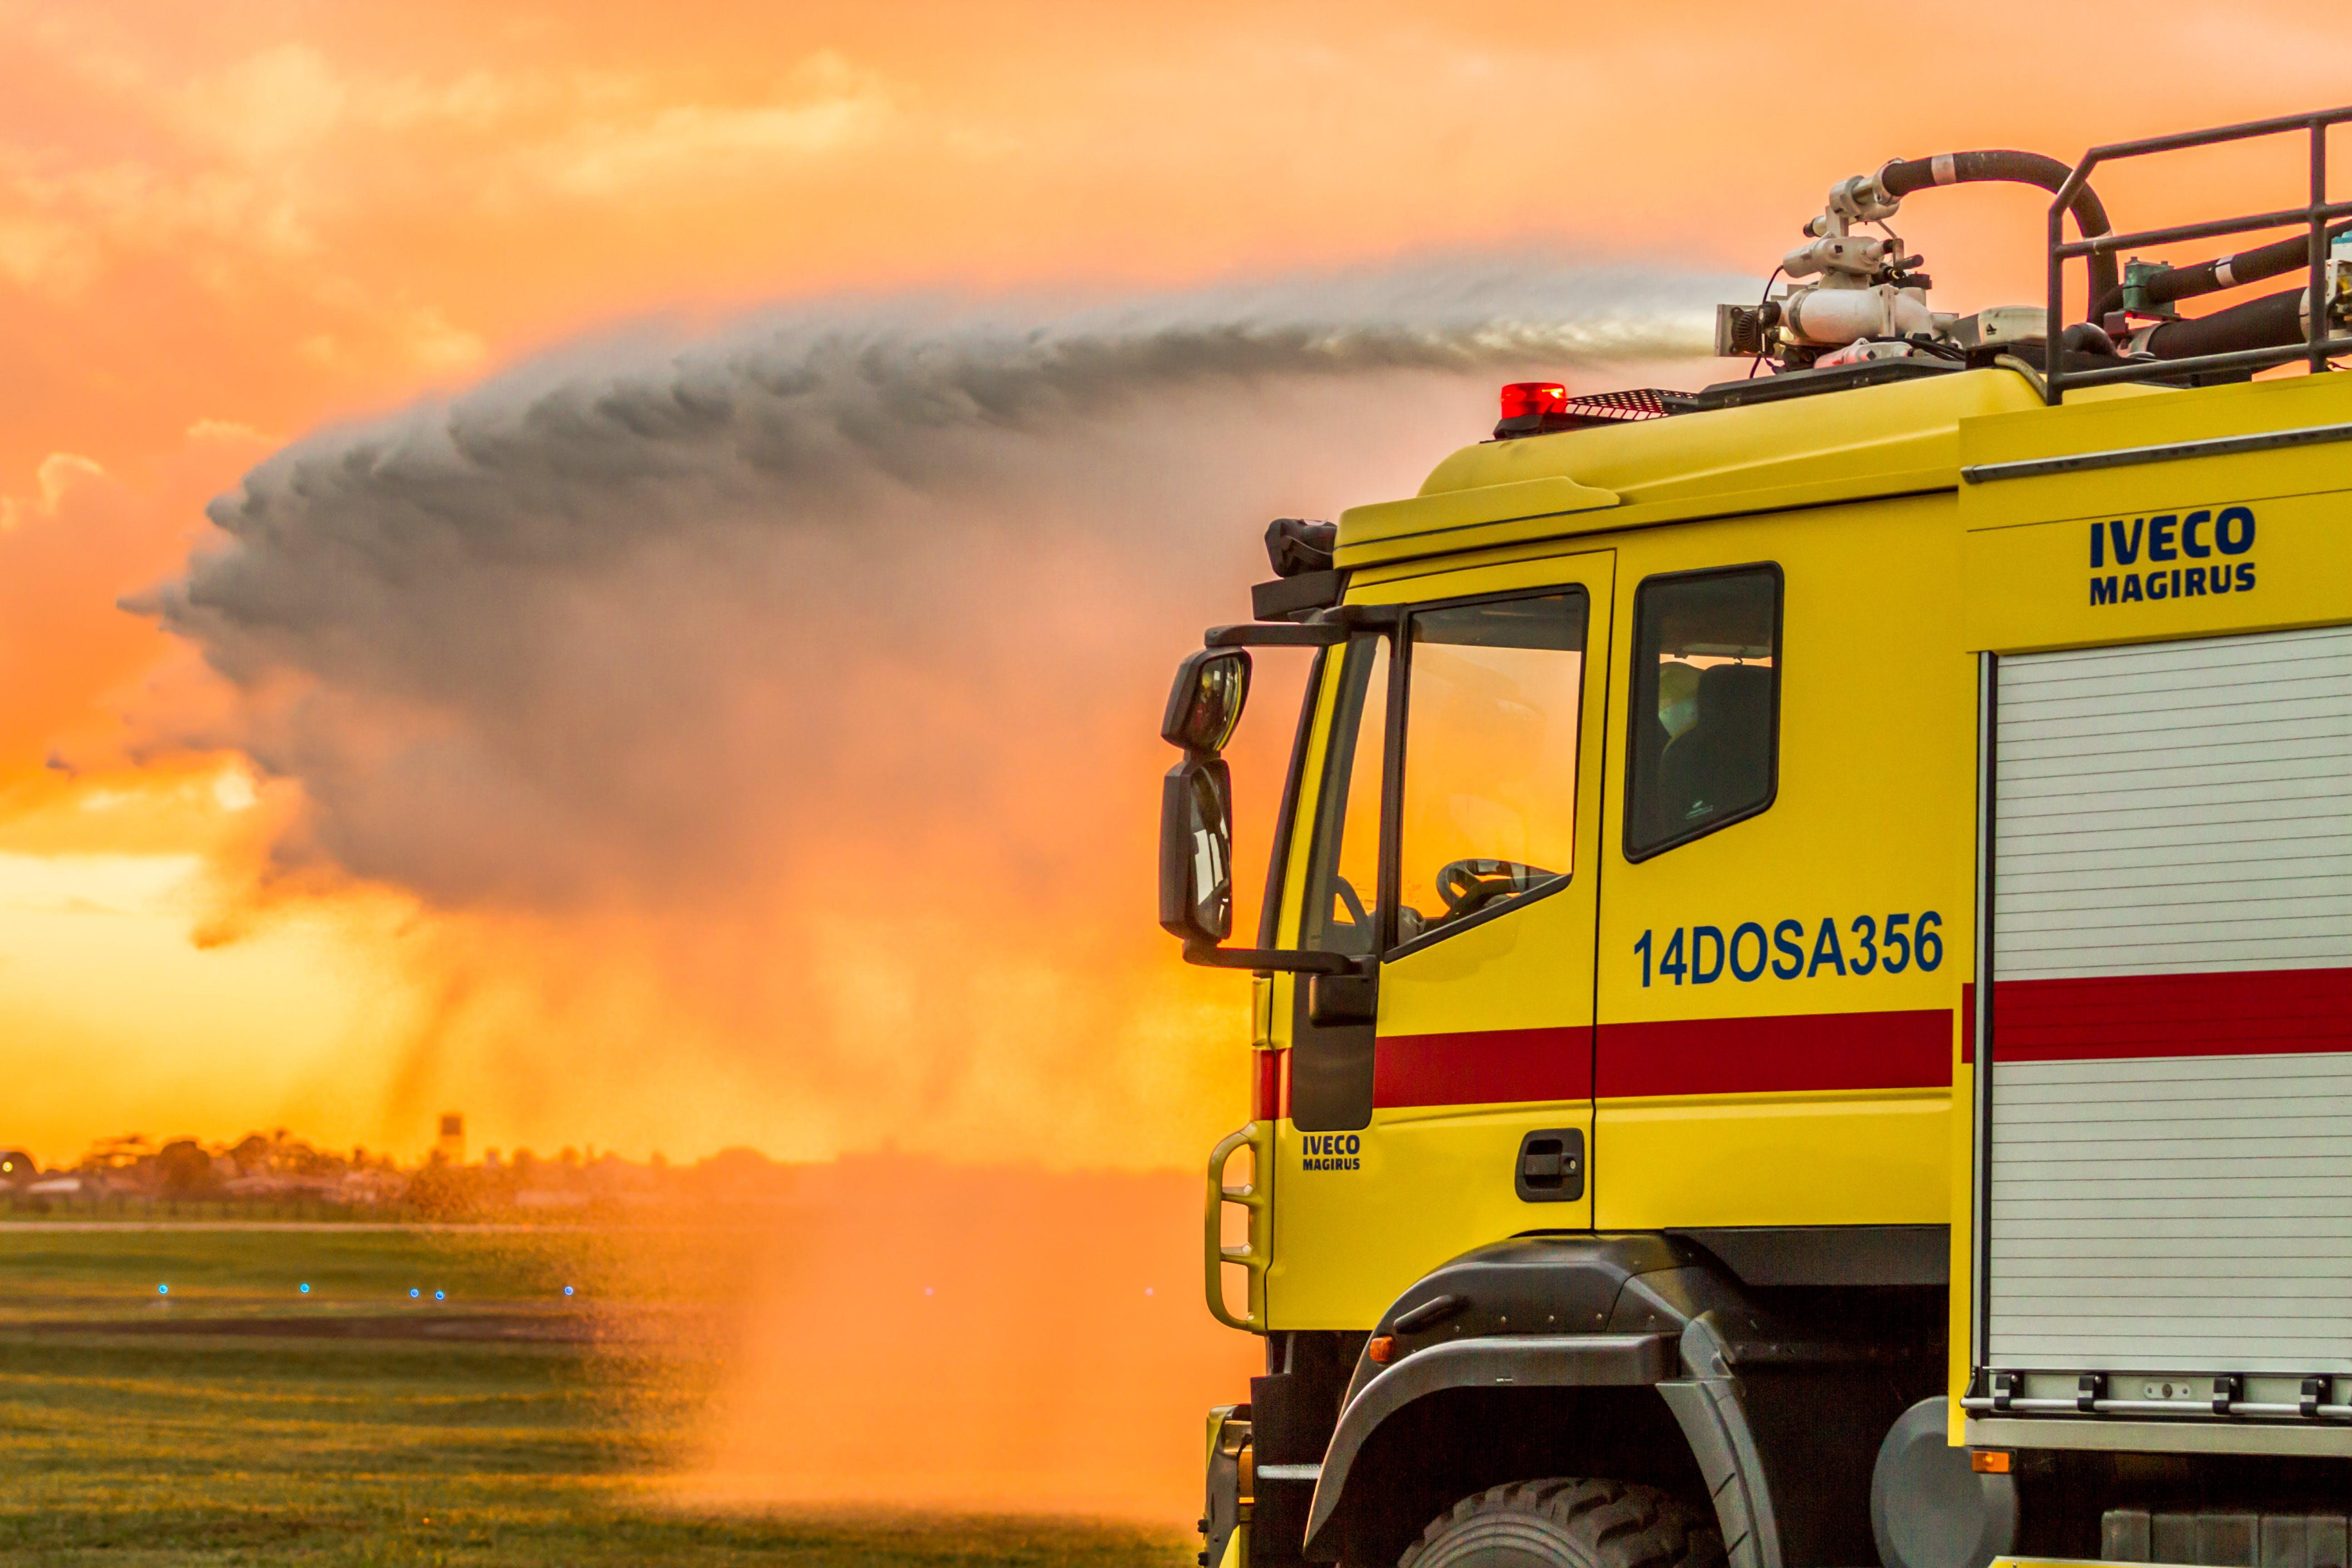 Fotos de stock gratuitas de agua, amanecer, camión, camión de bomberos